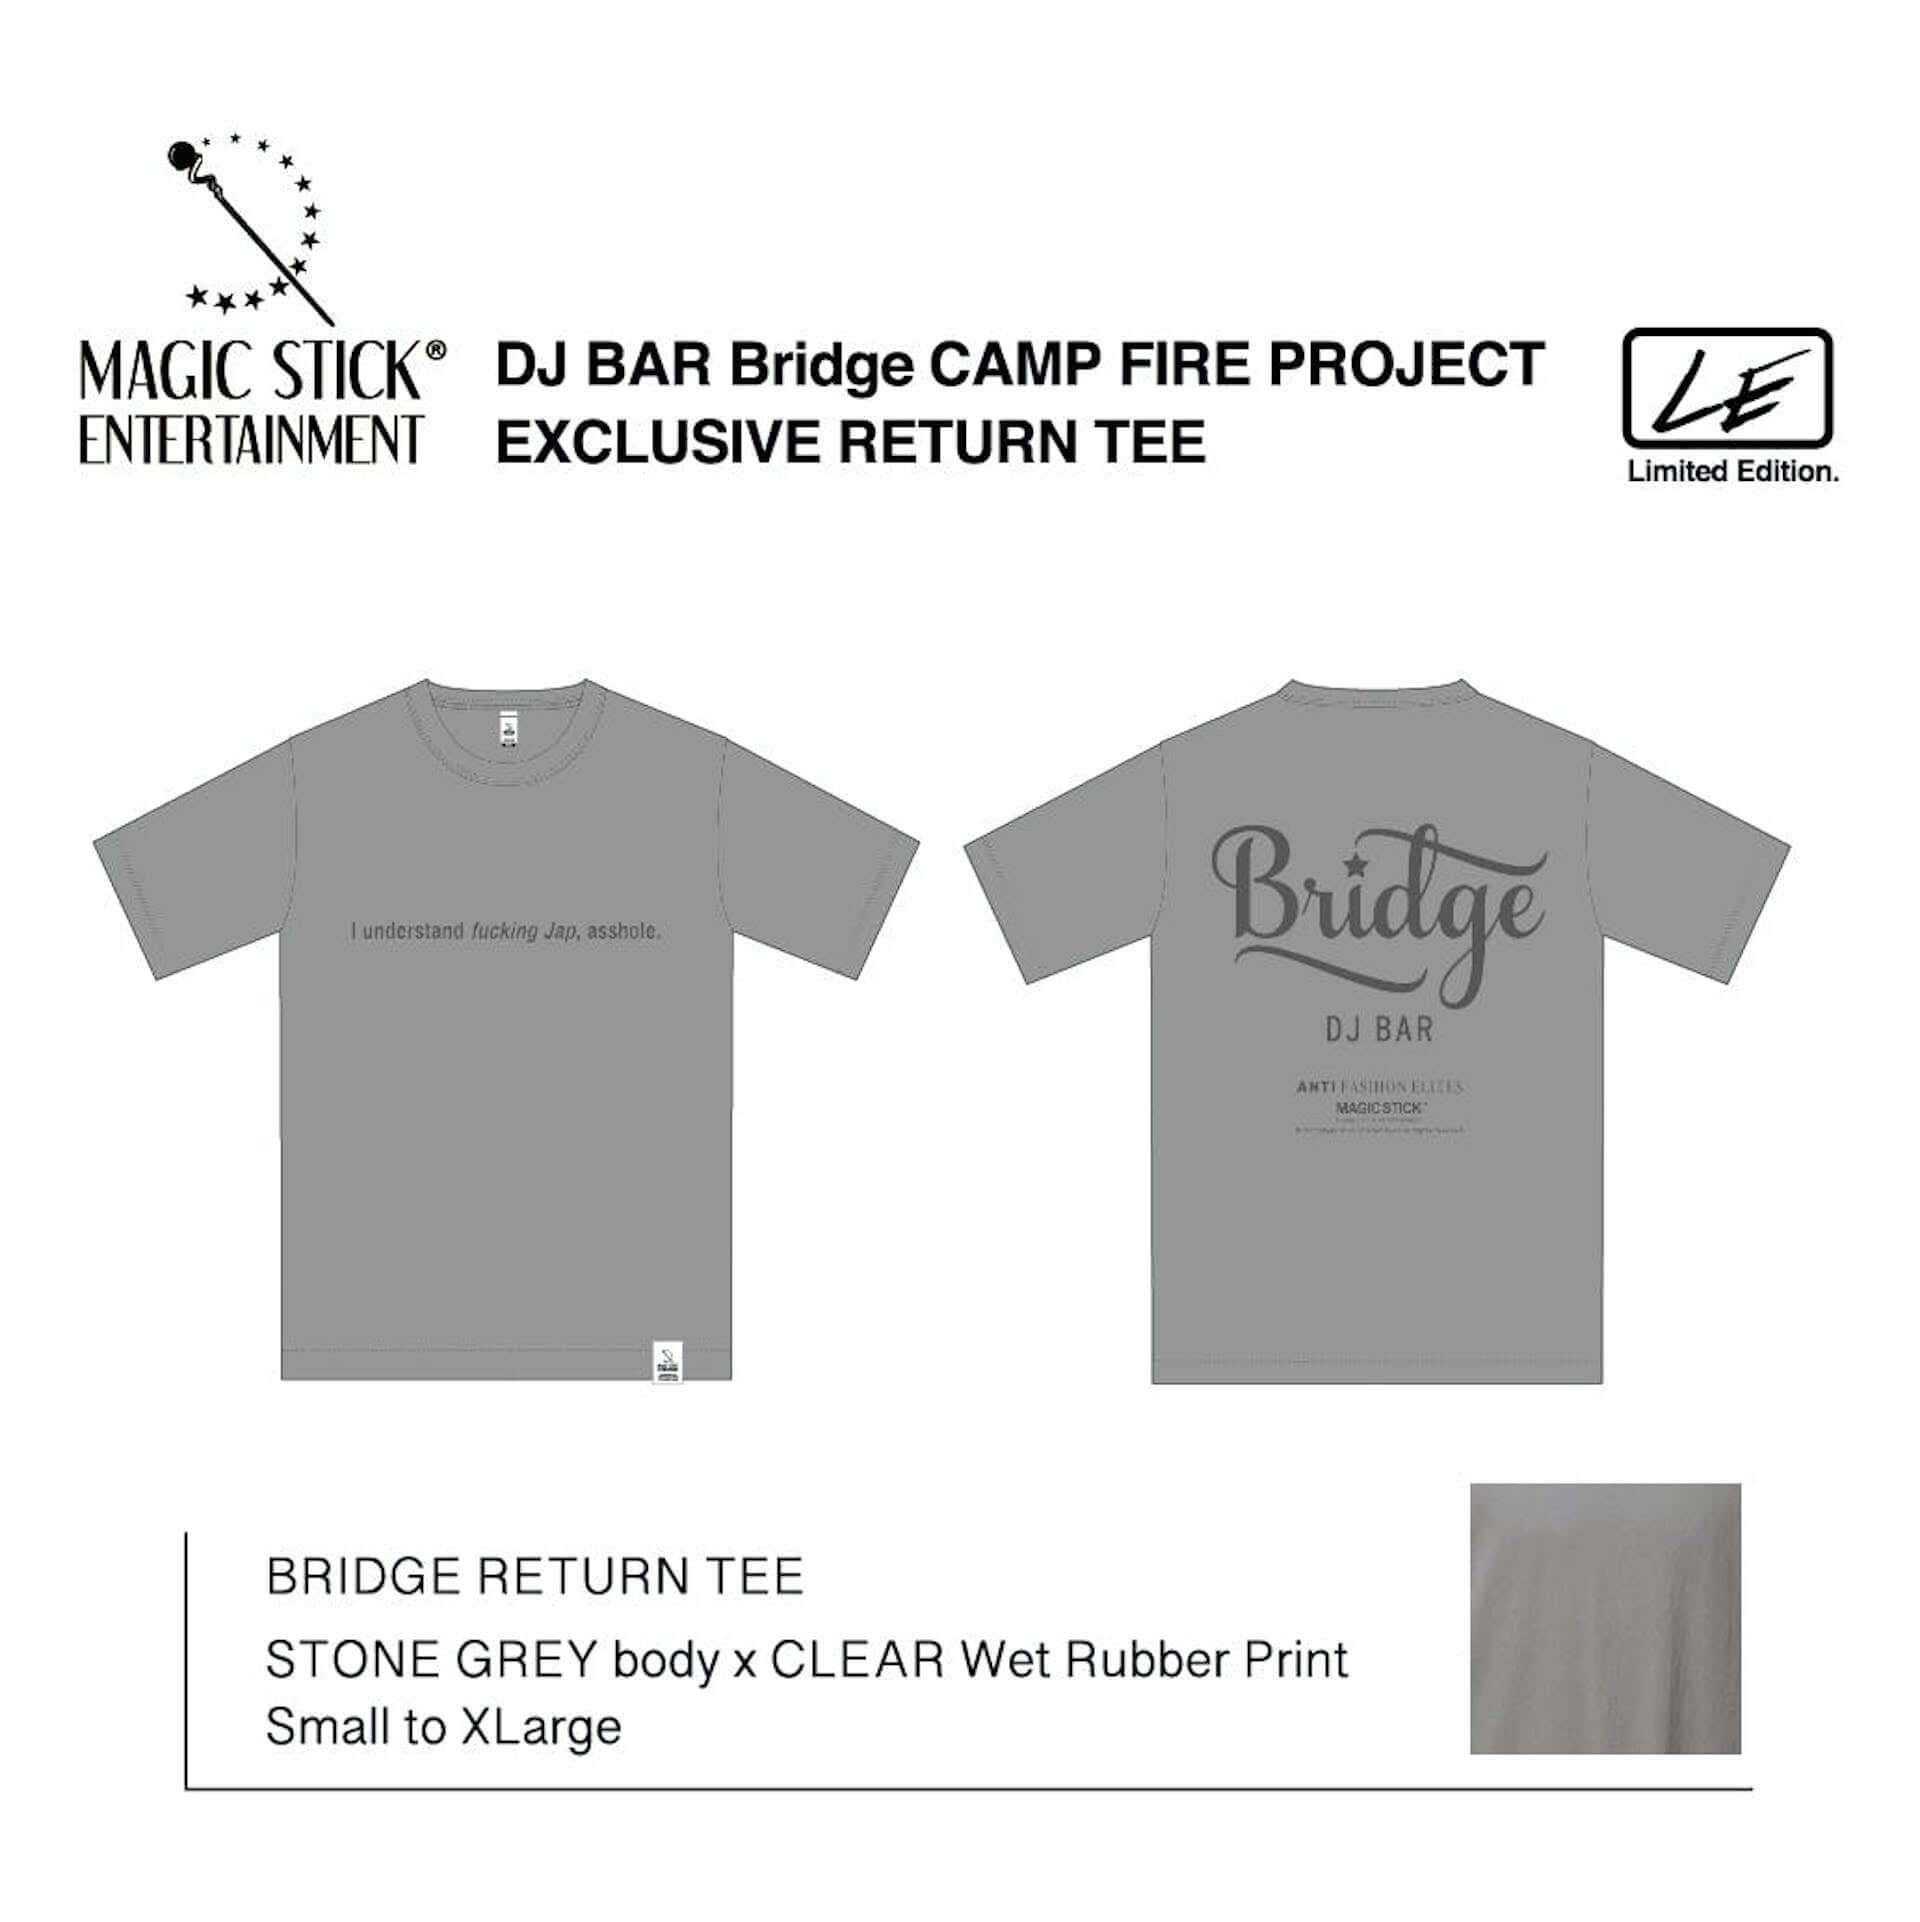 DJ BAR Bridgeが、店舗存続のための緊急支援をクラウドファンディングで募集中!リターンには非売品Tシャツも music200525_bridge_fire_02-1920x1922